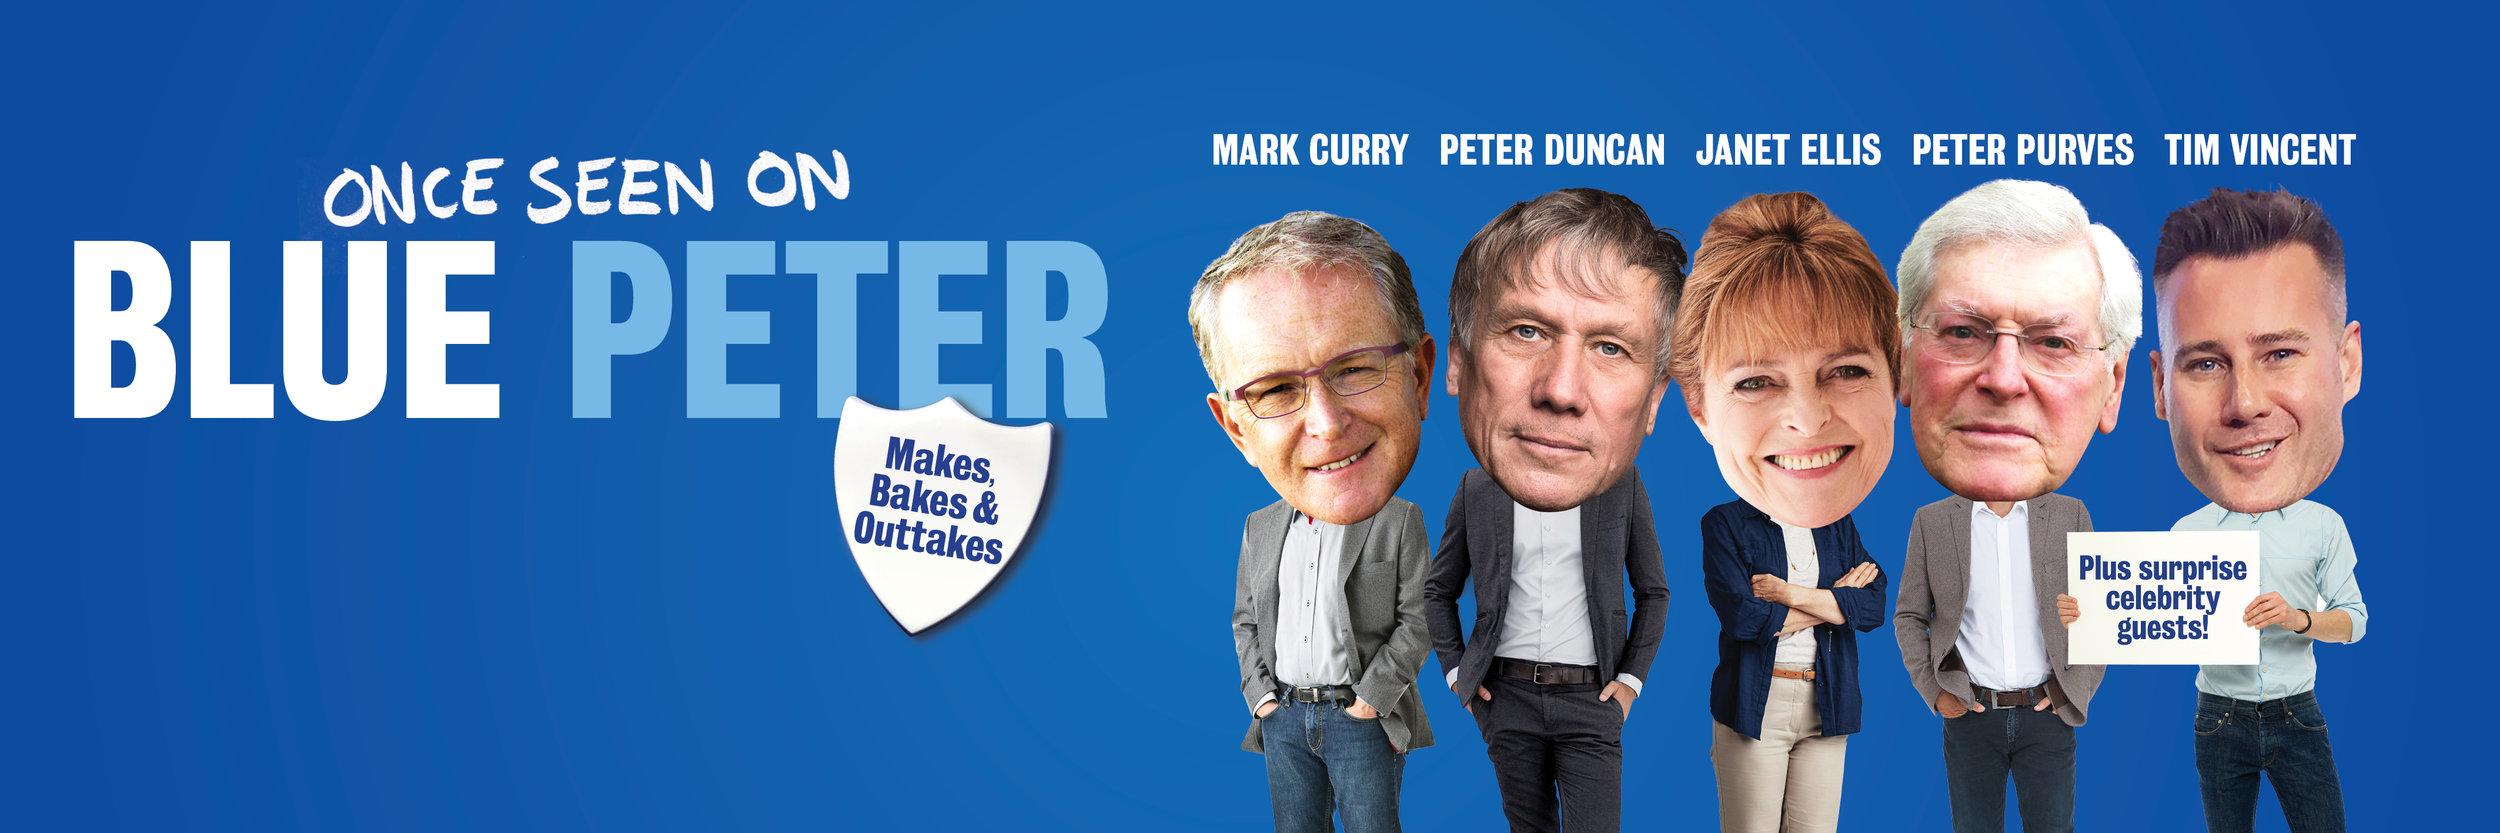 Blue Peter_twitterCover.jpg